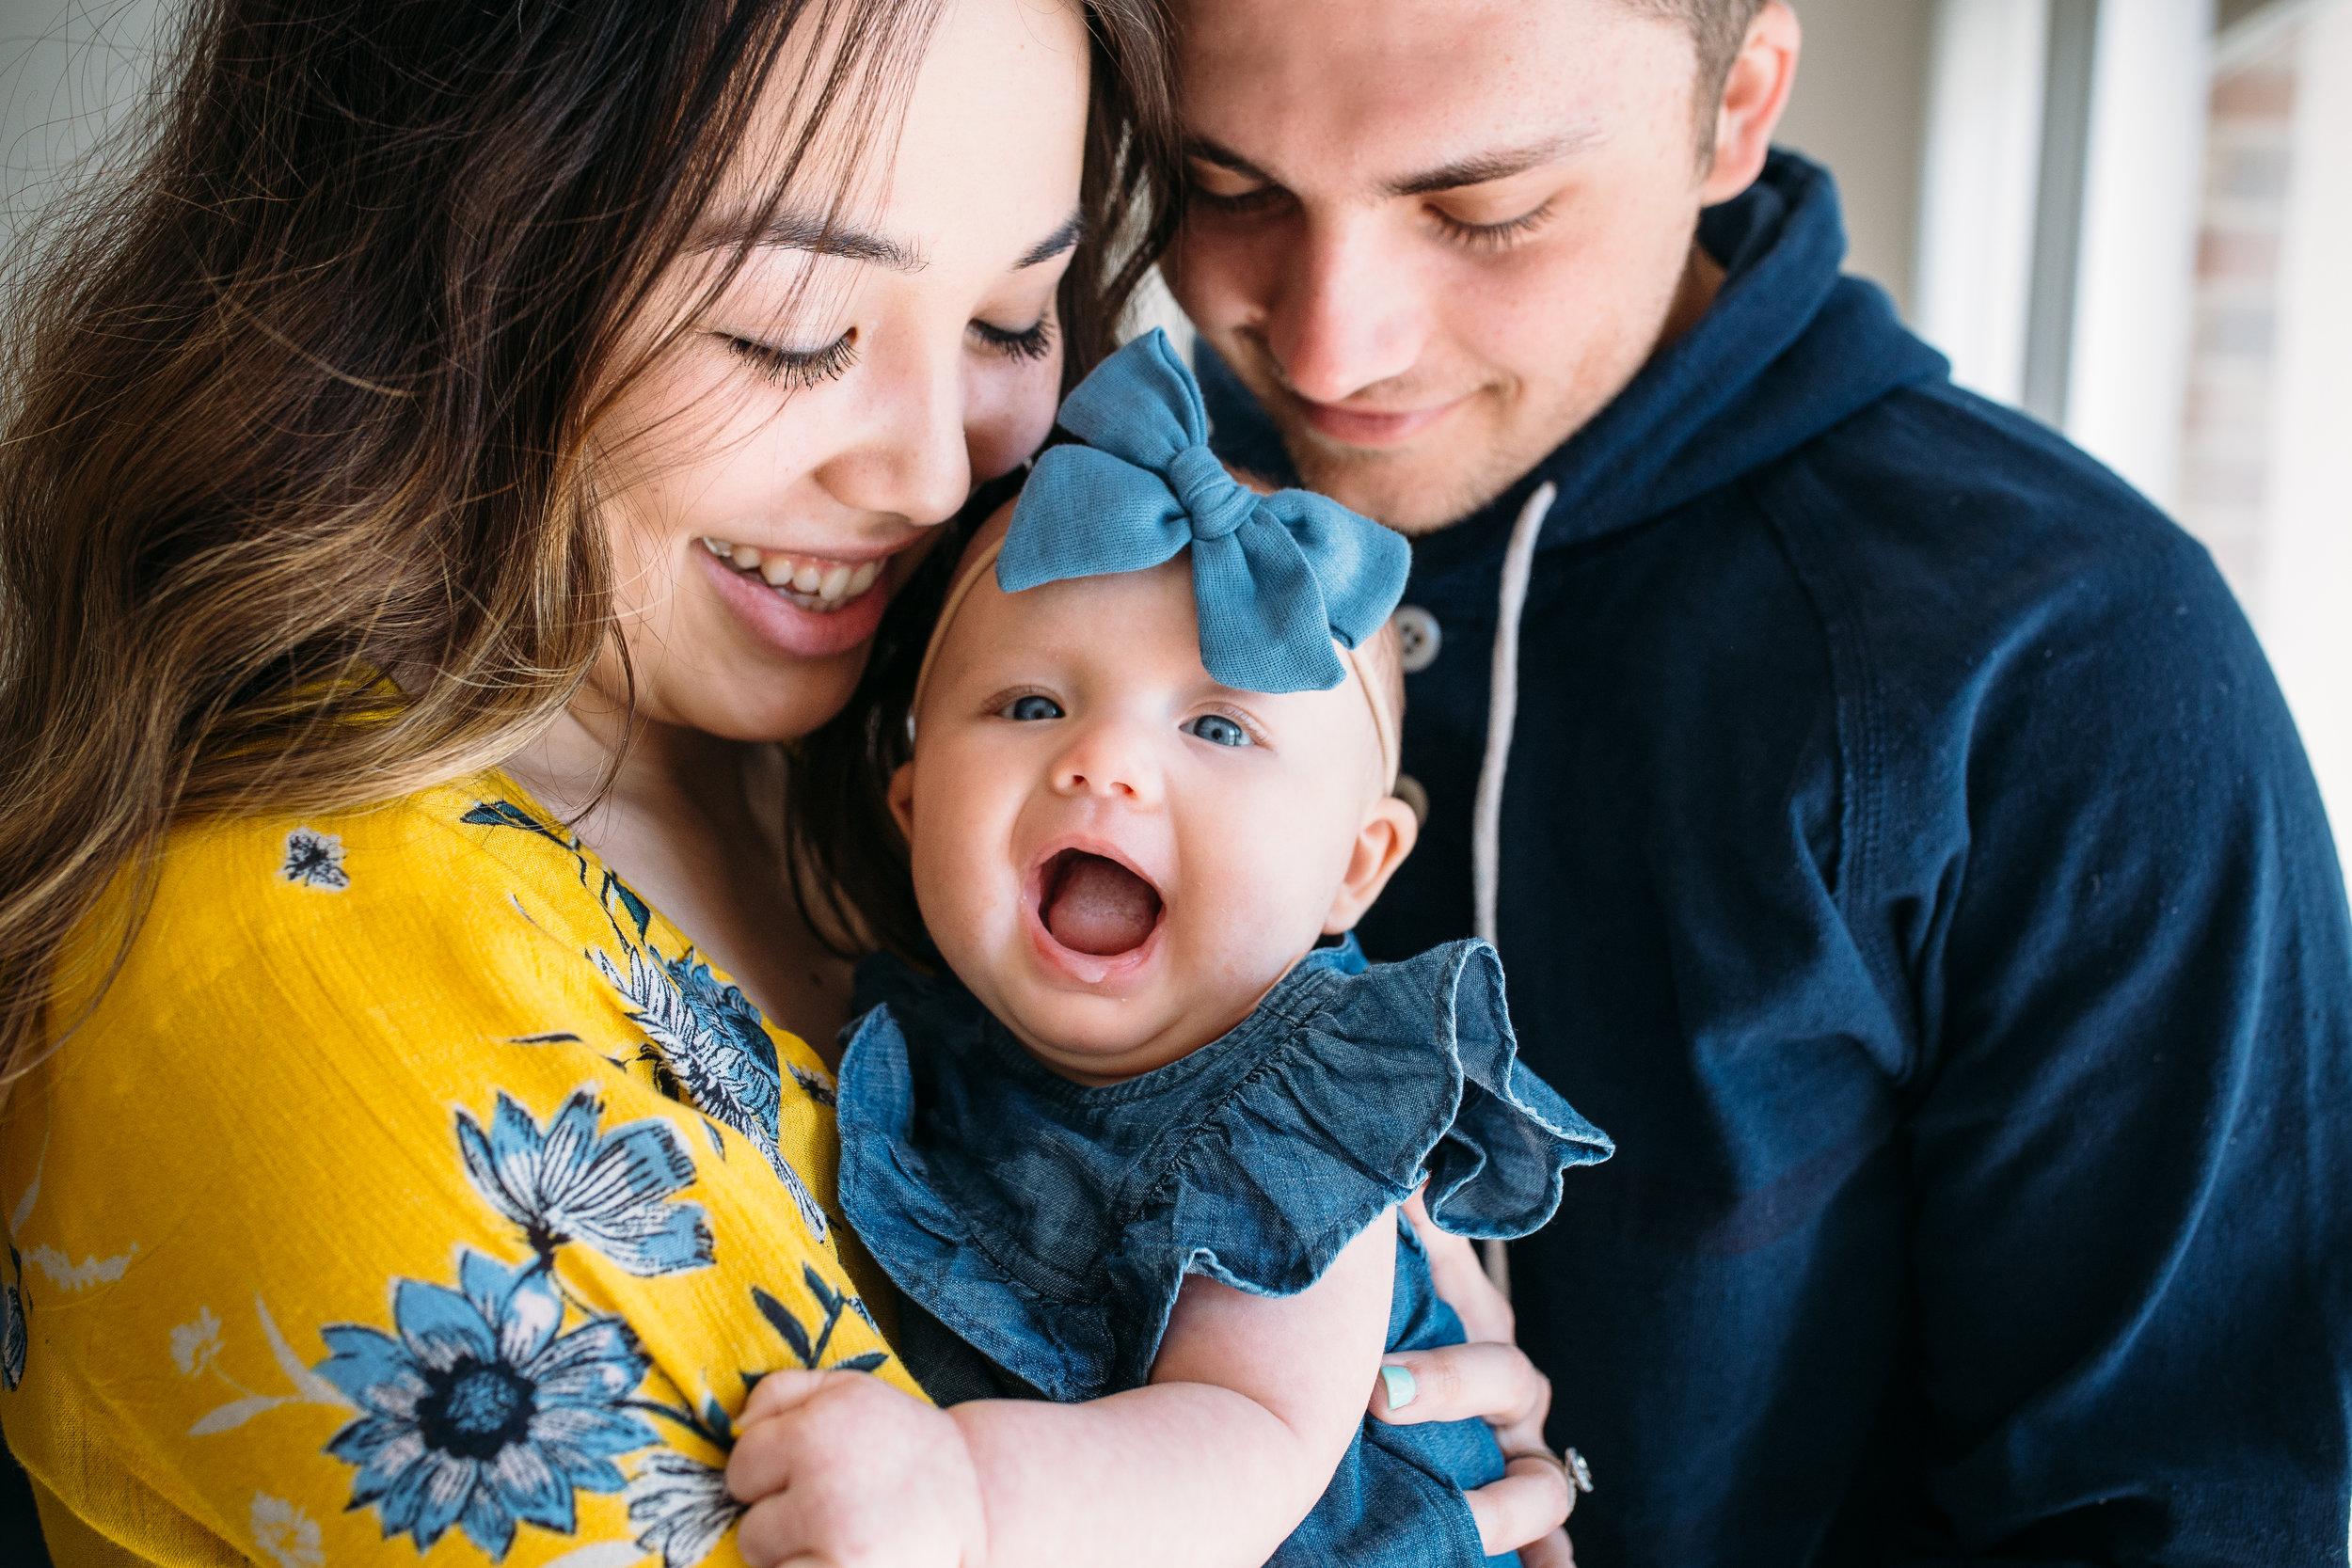 powis-motherhood-session-2_42044384931_o.jpg